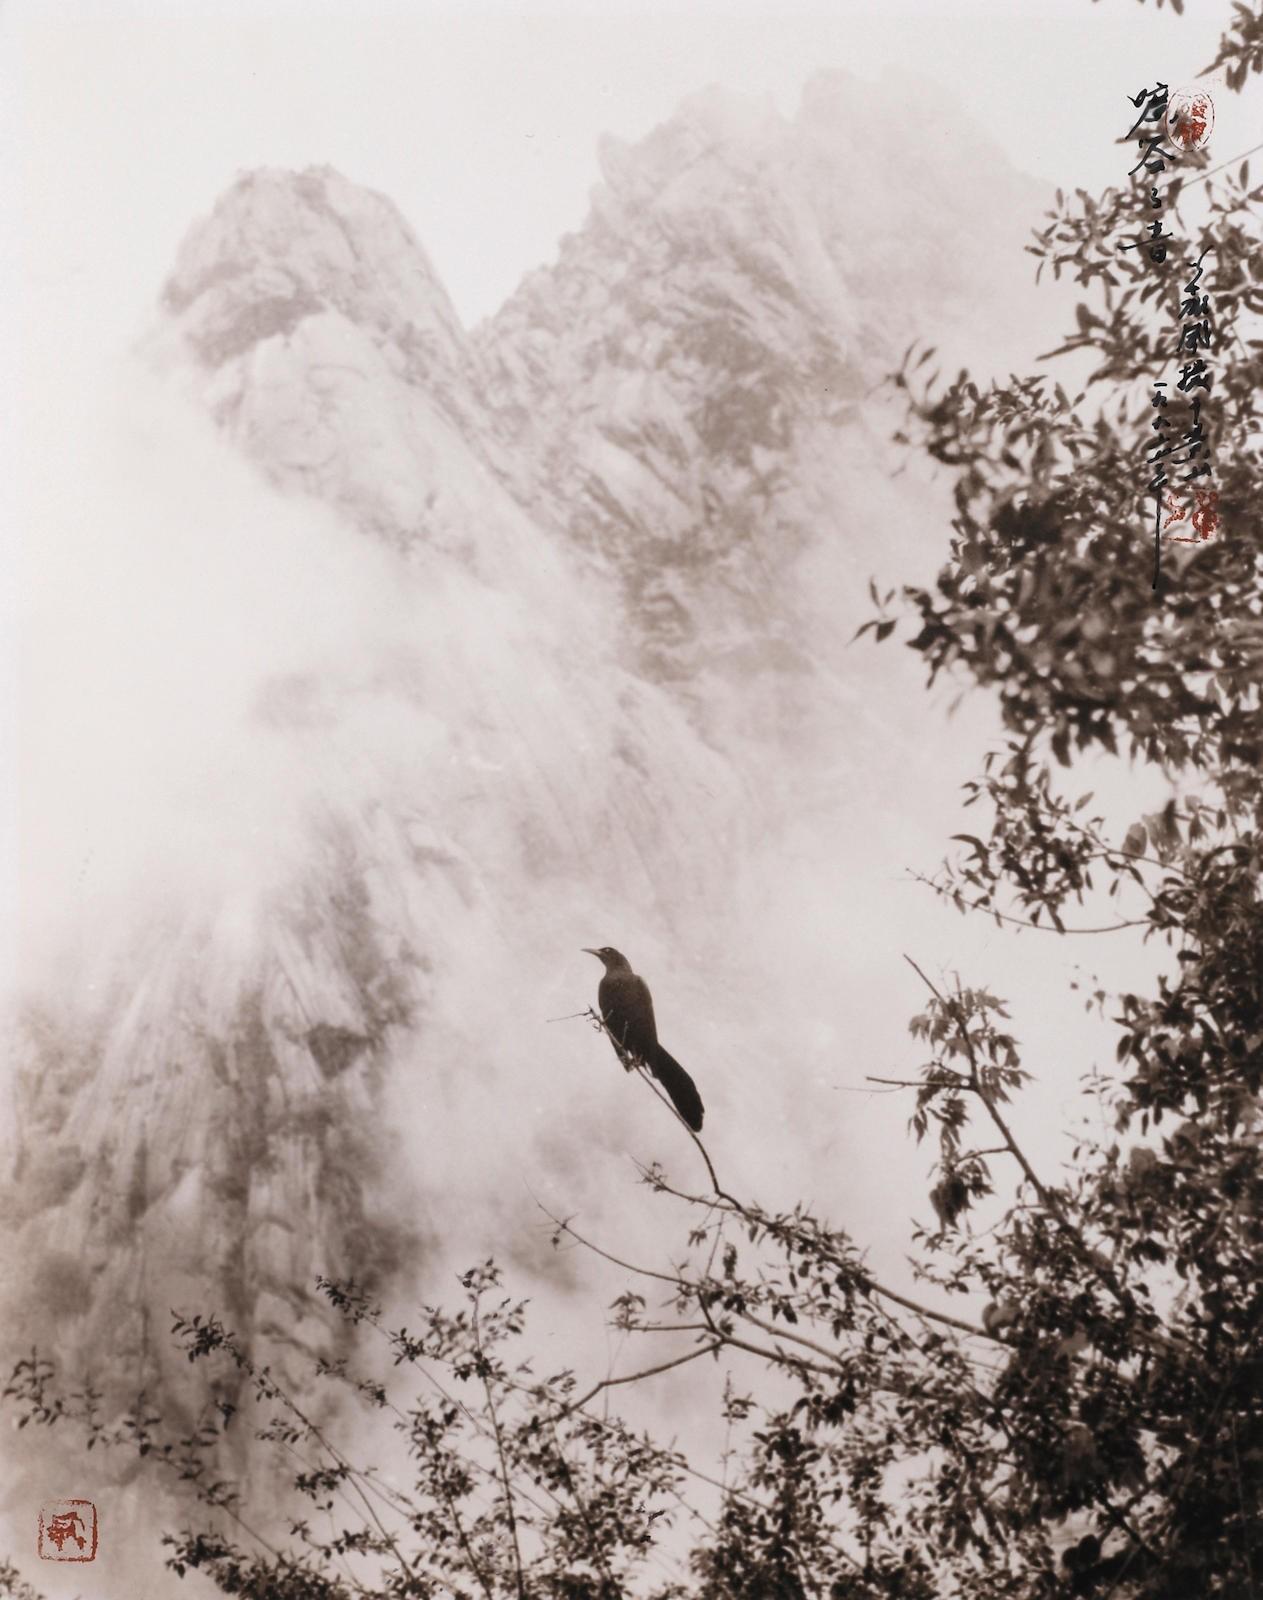 Птица на дереве в горах. Автор Дон Хонг-Оай